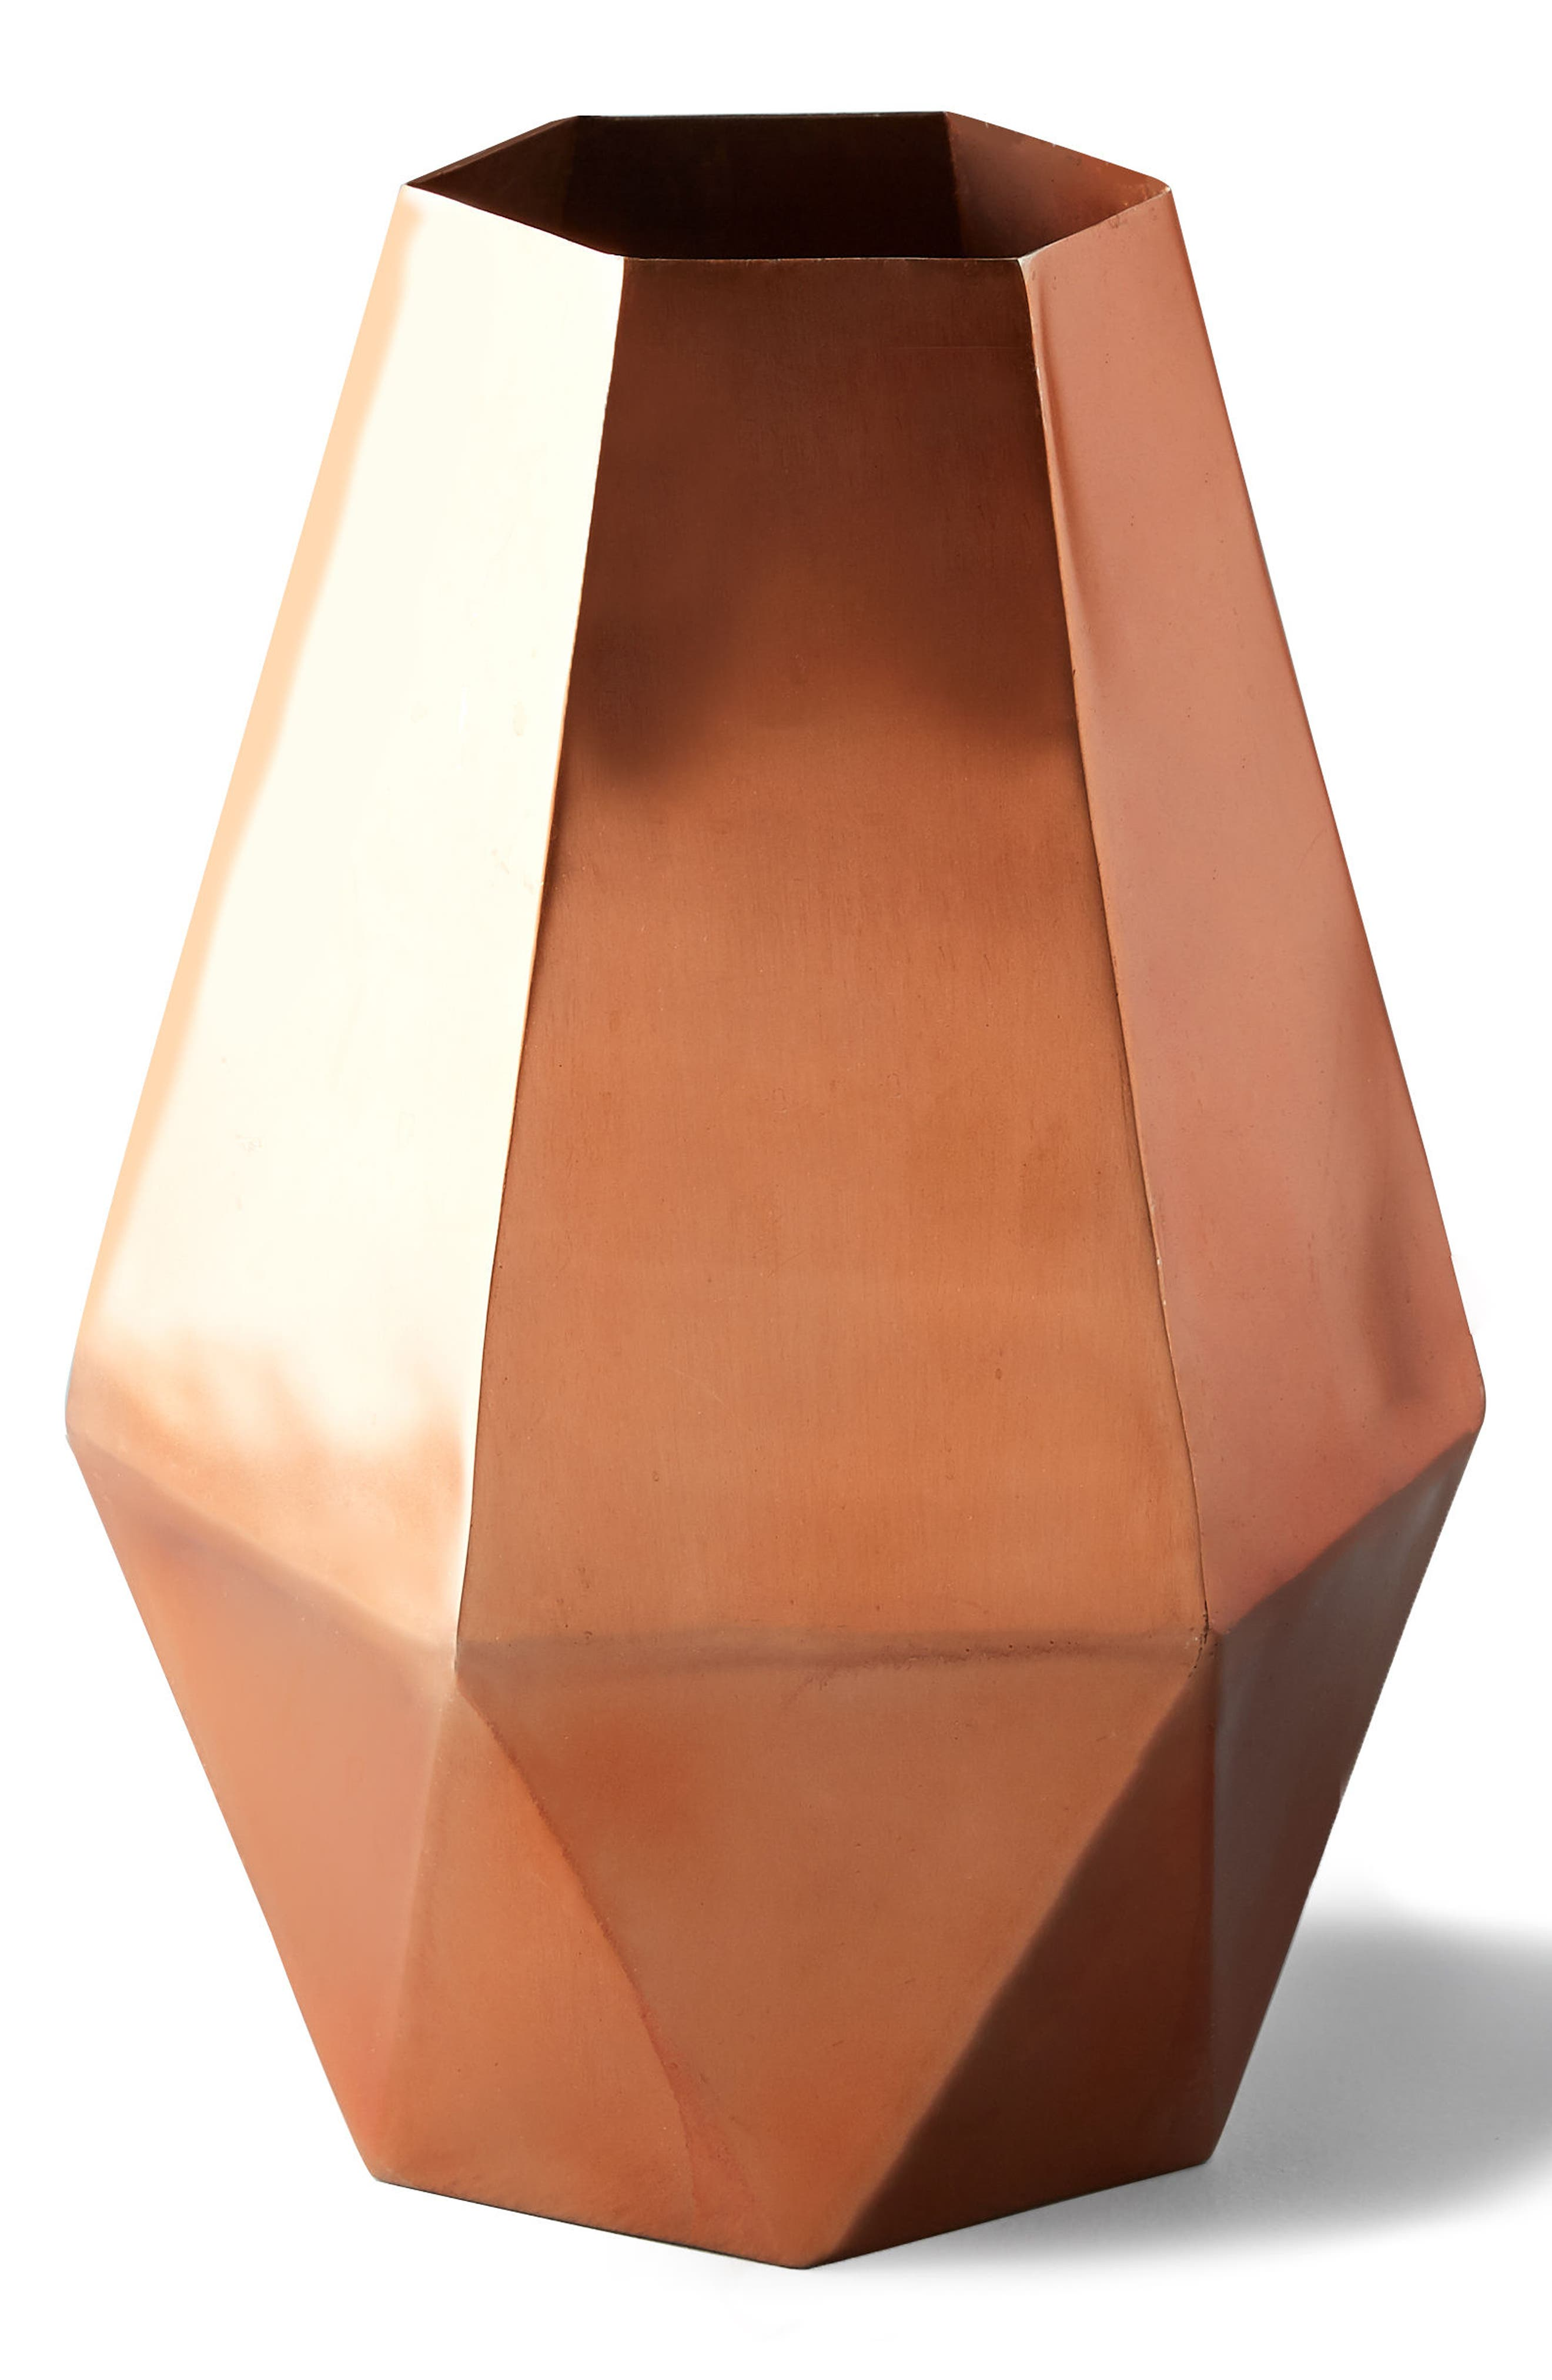 Faceted Hexagon Metal Vase,                             Alternate thumbnail 2, color,                             220